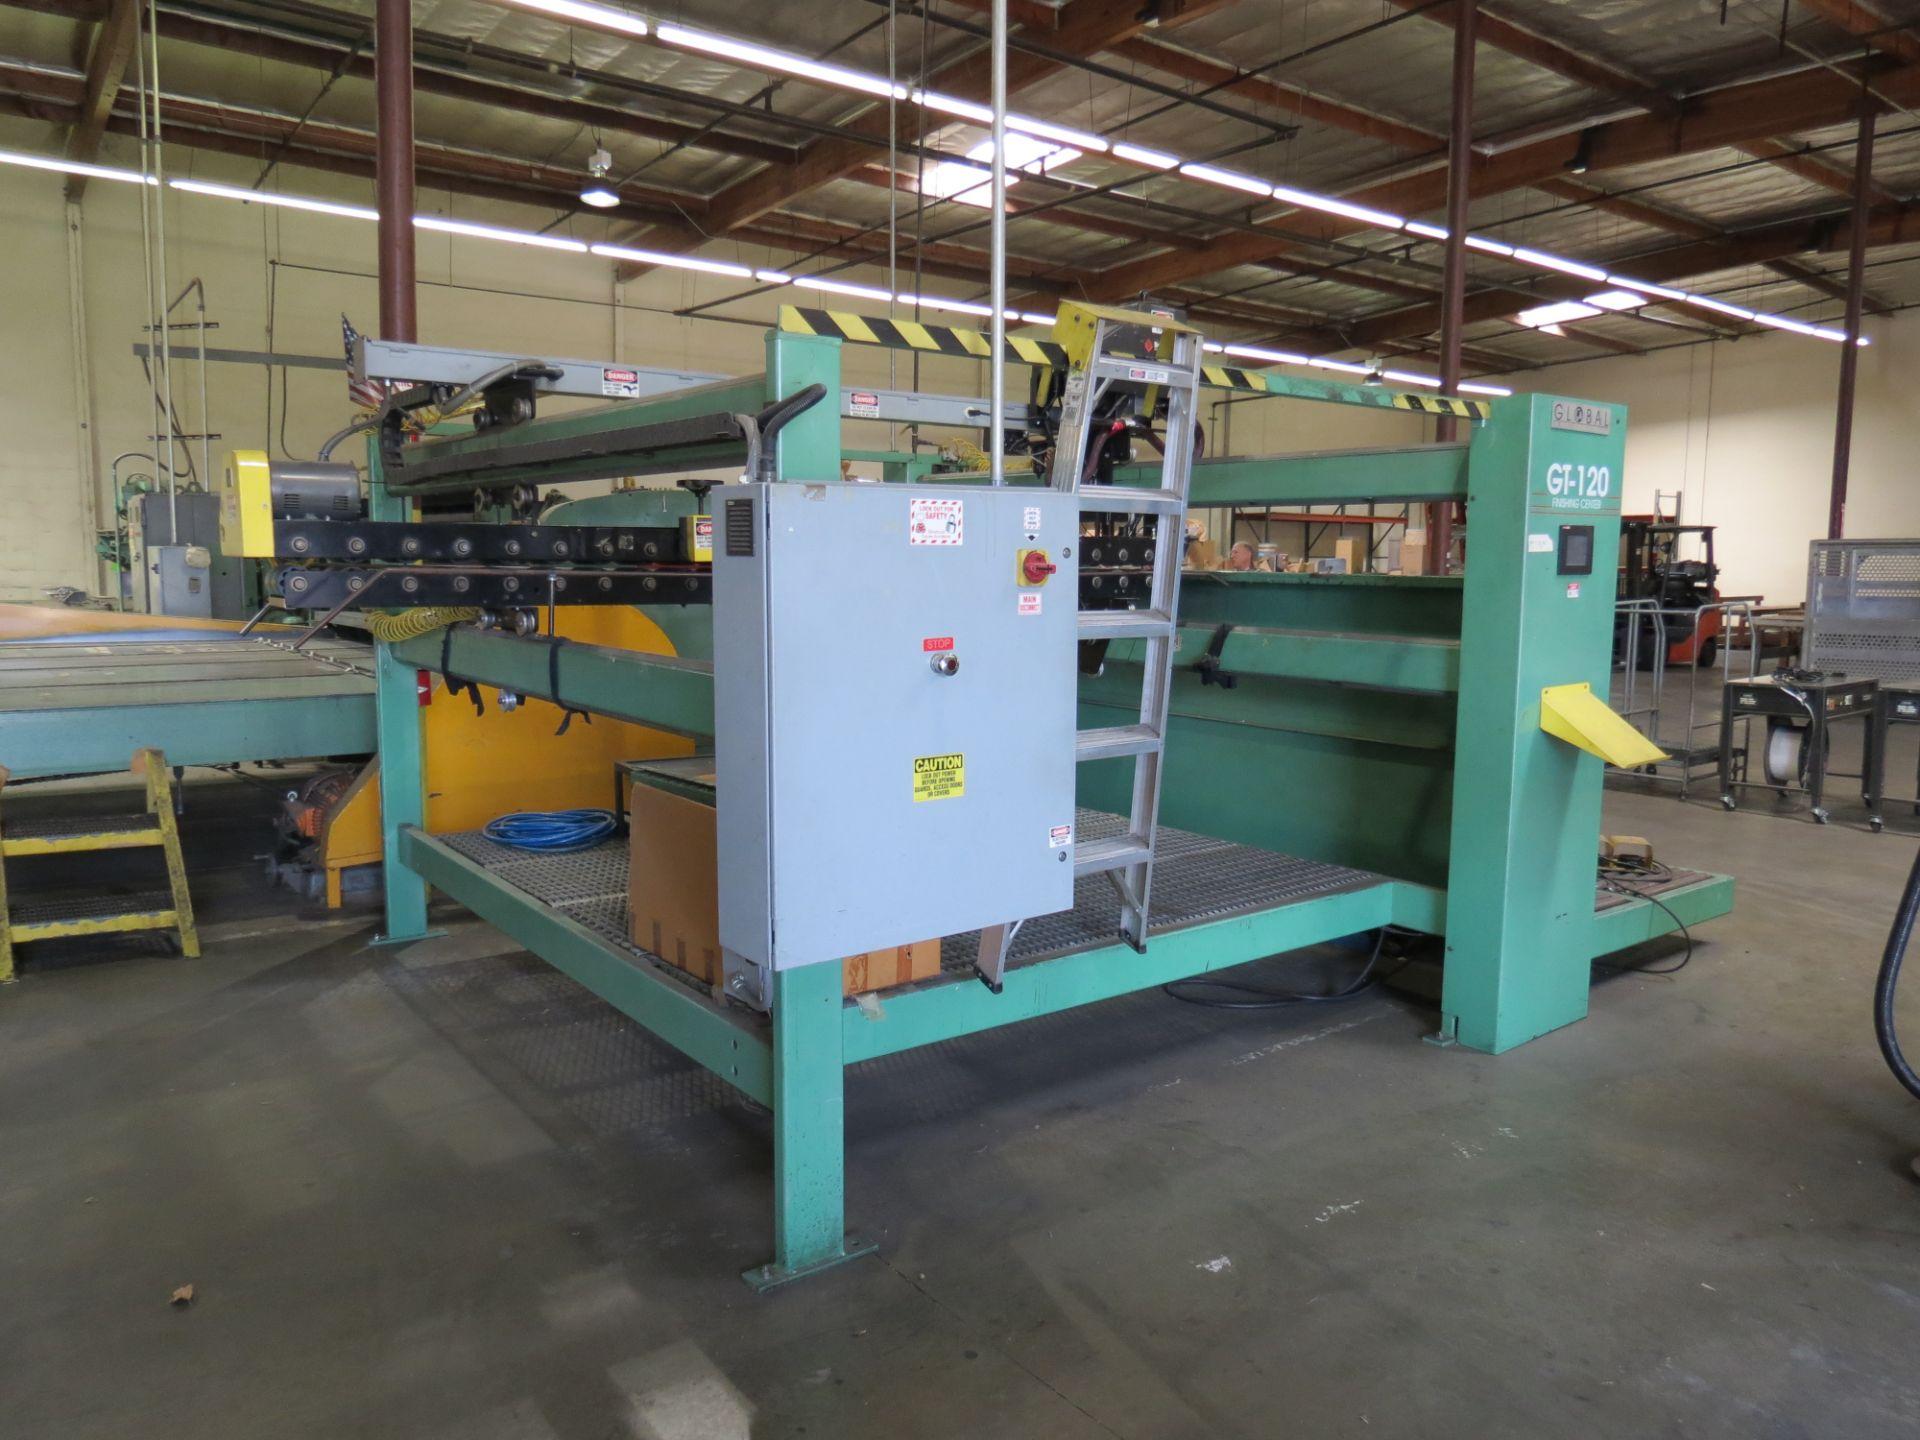 Lot 1 - Global GT-120 Finishing Center Glue Machine with Benchmark Hot Melt